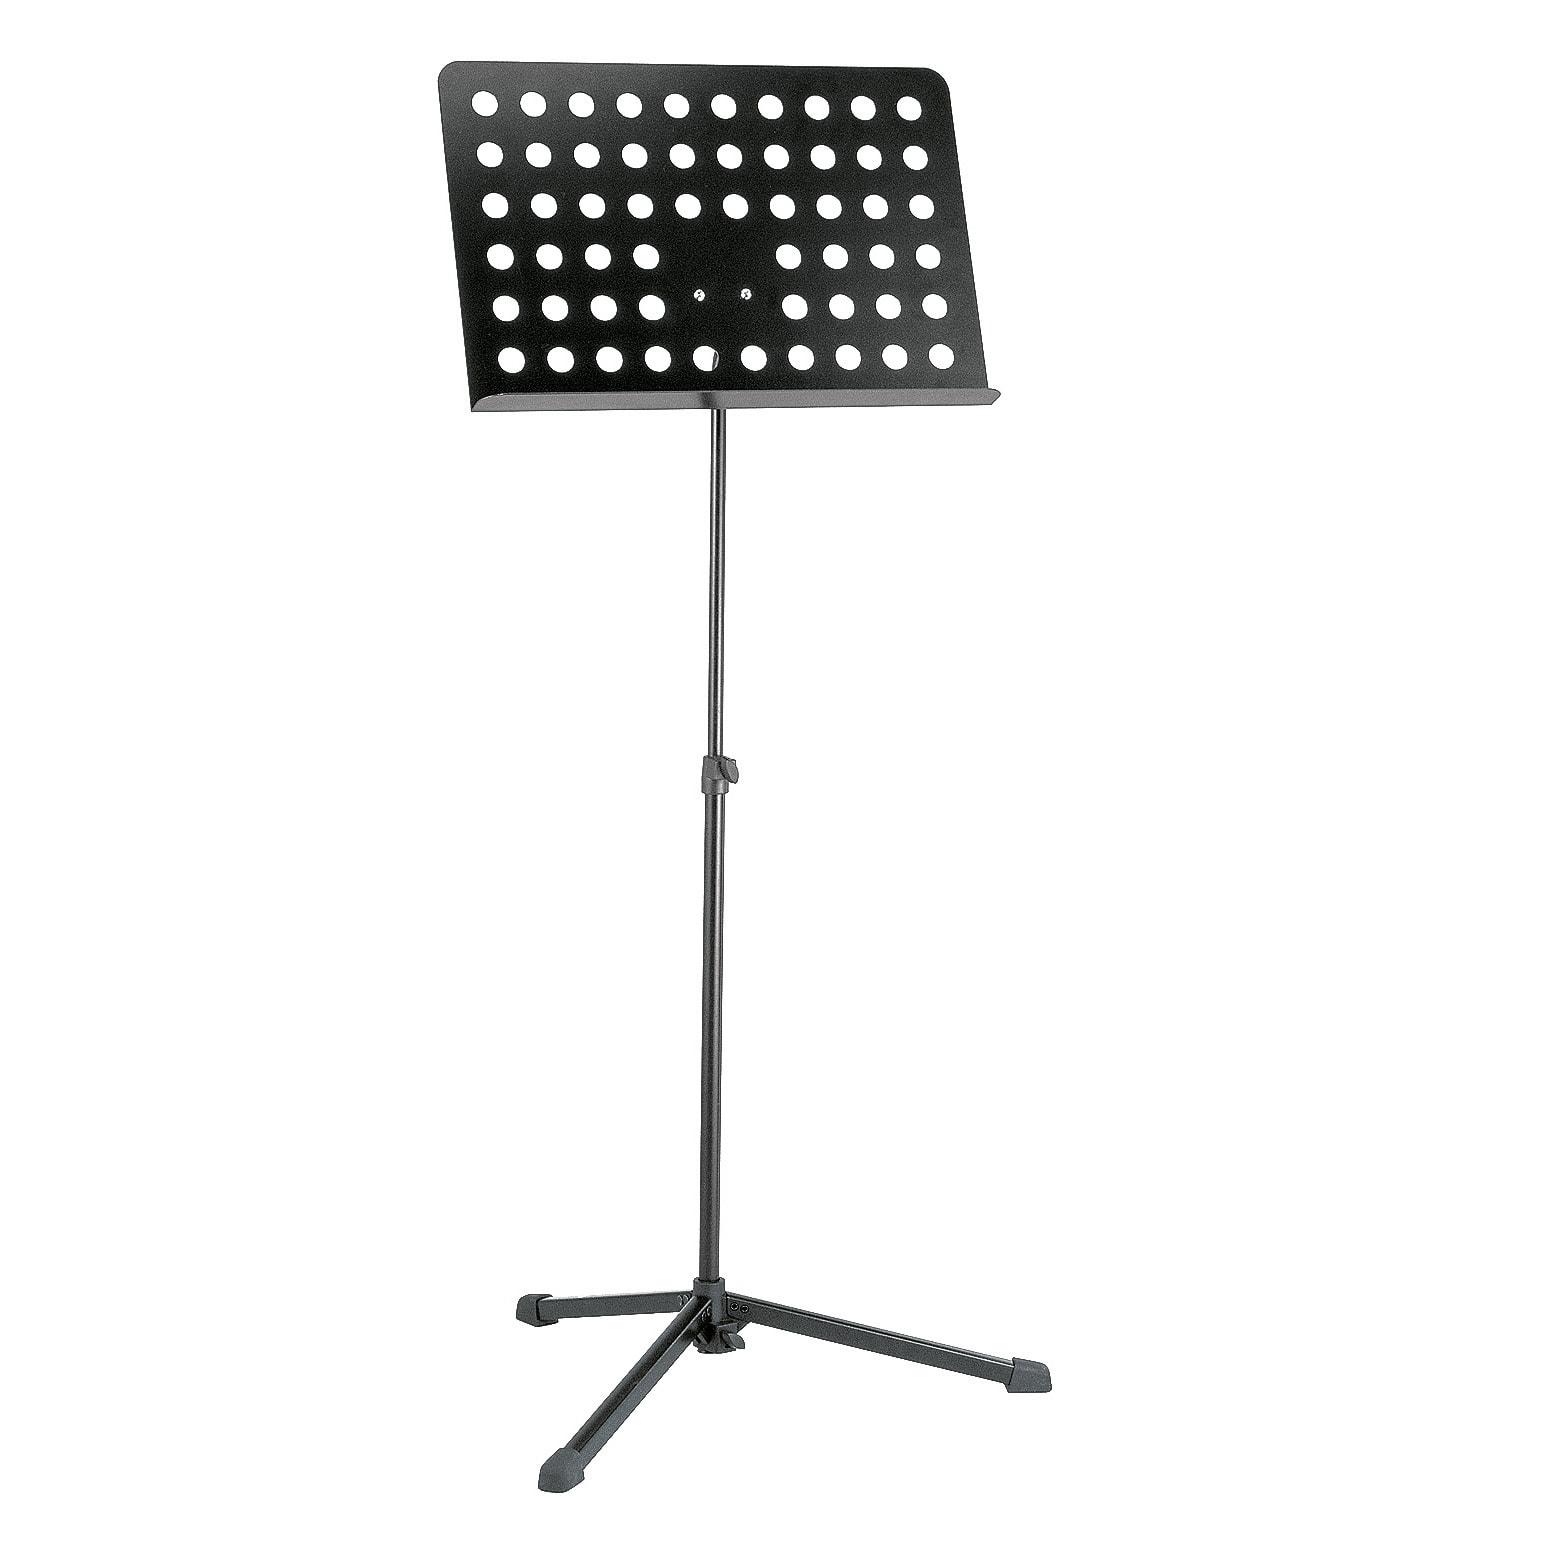 KM12179 - Music stand